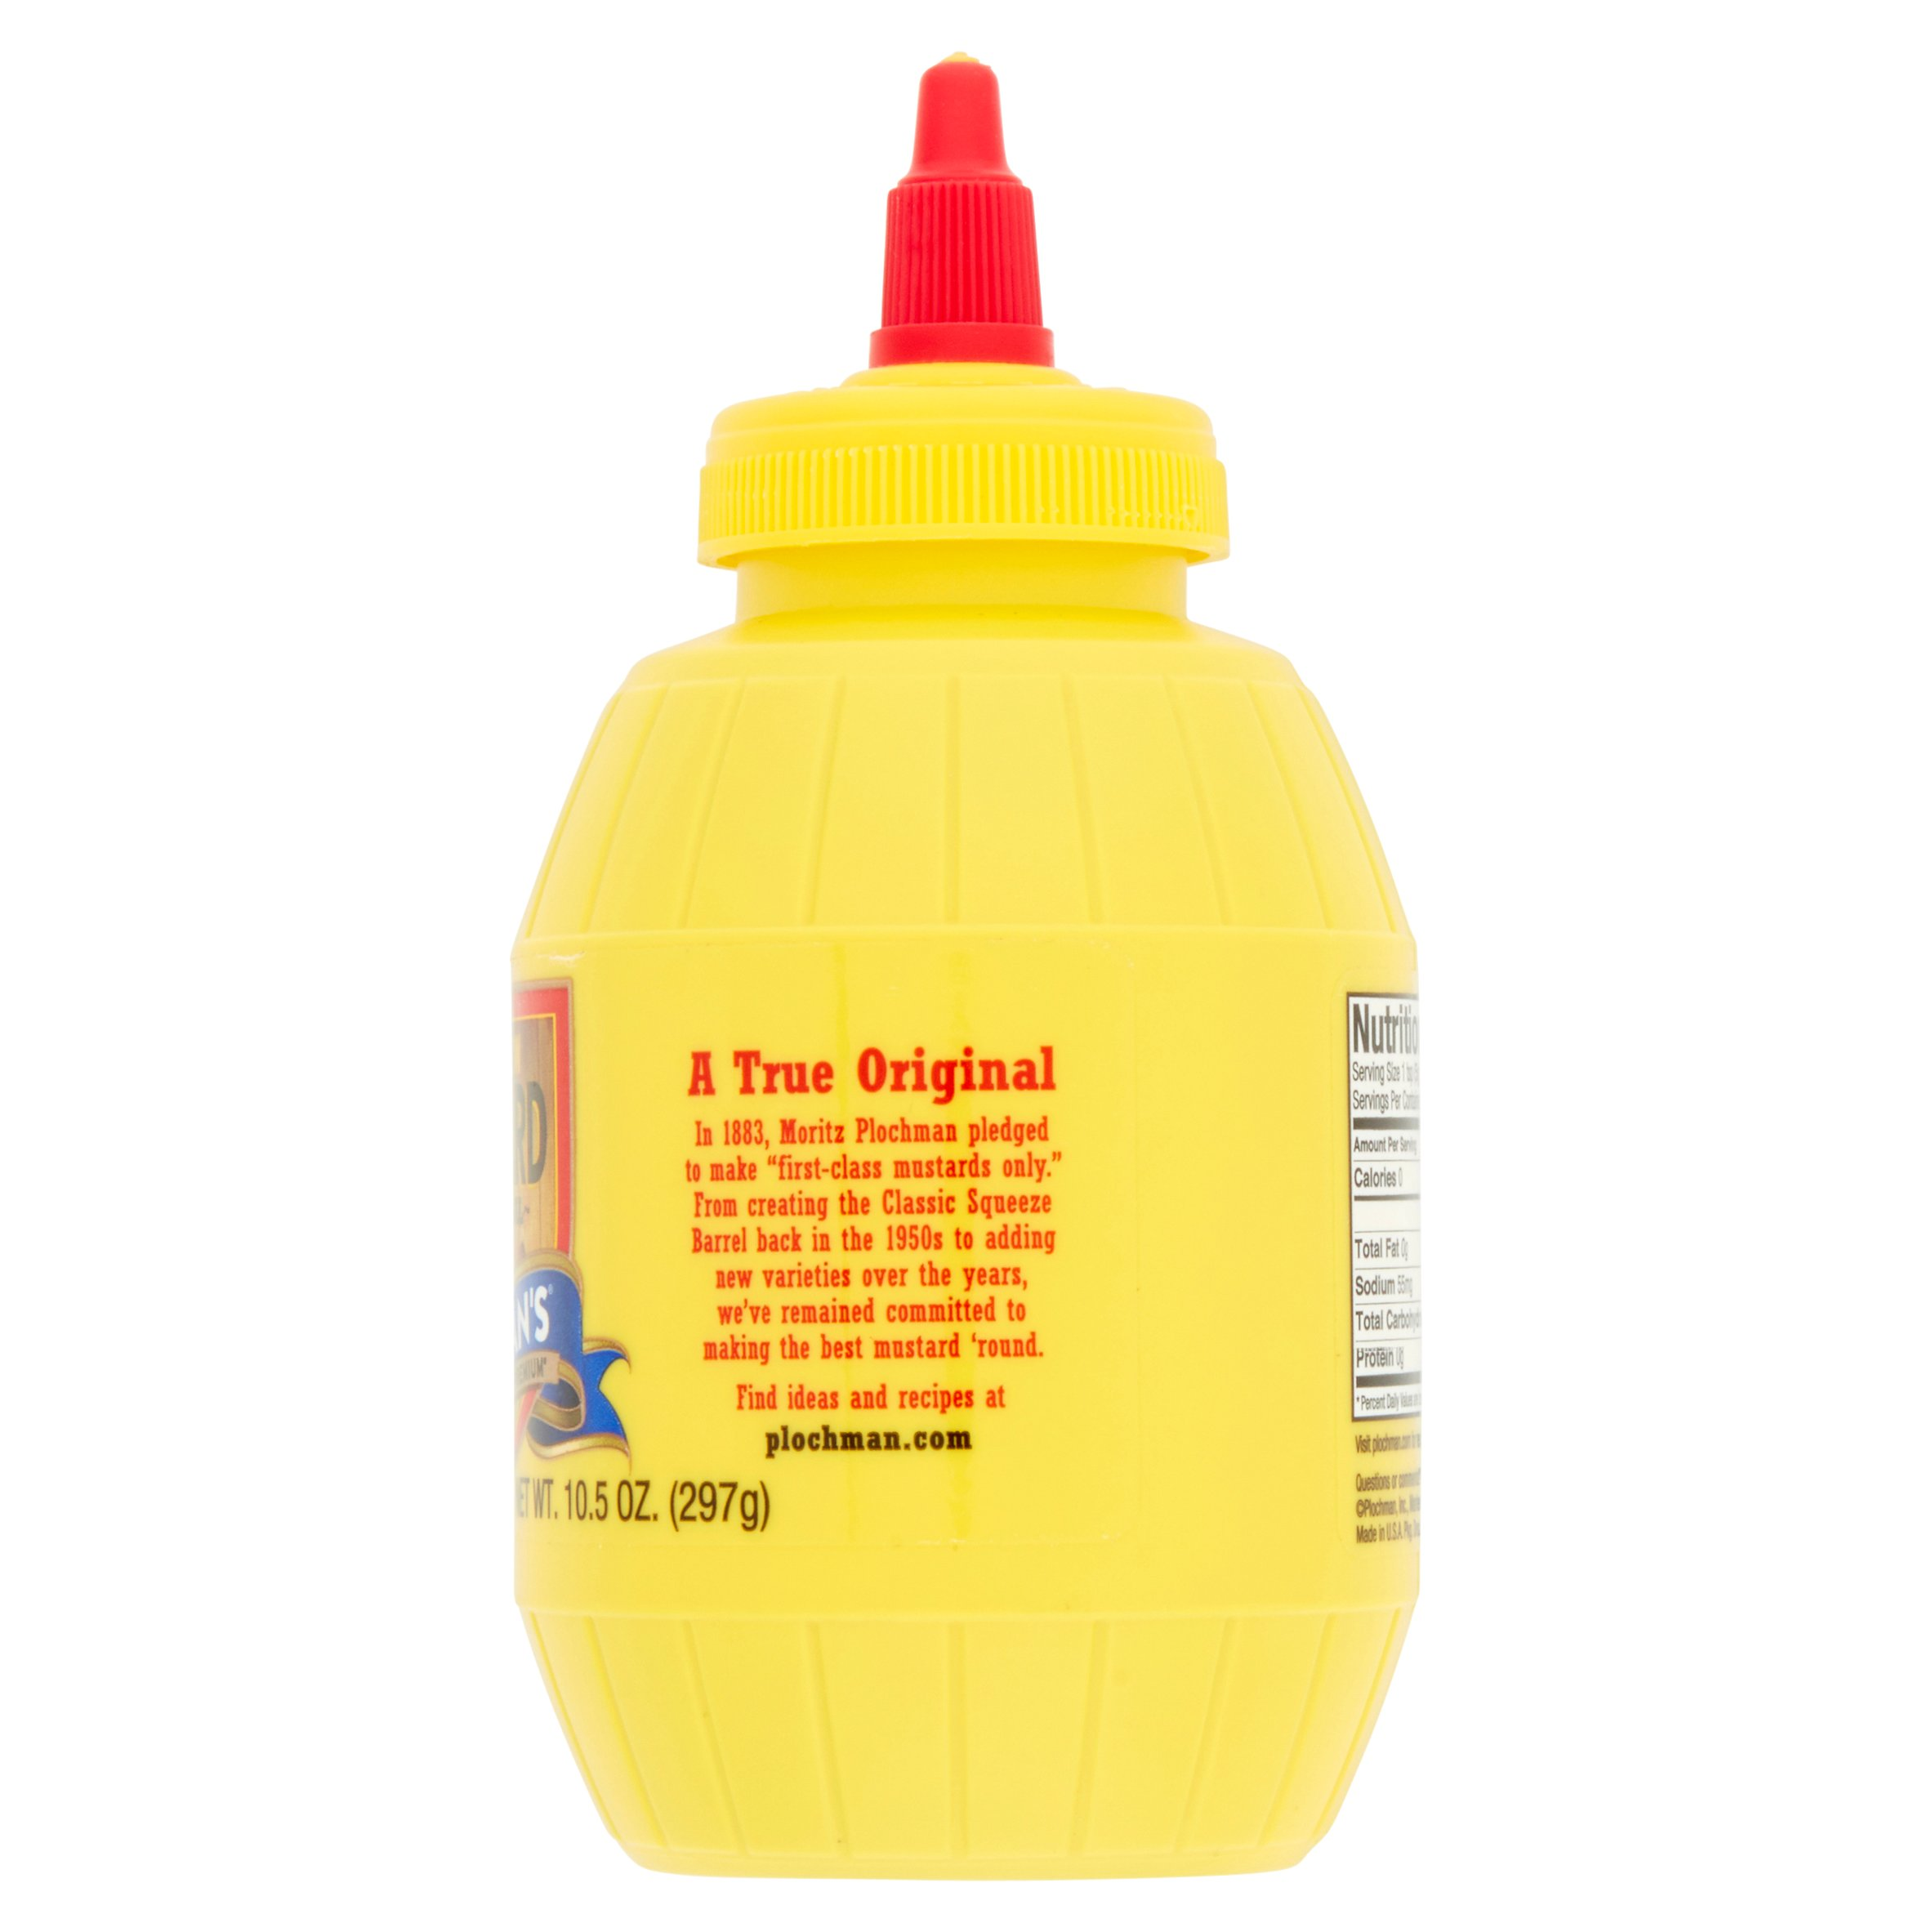 Plochman's Premium Mild Yellow Mustard, 10 5 oz